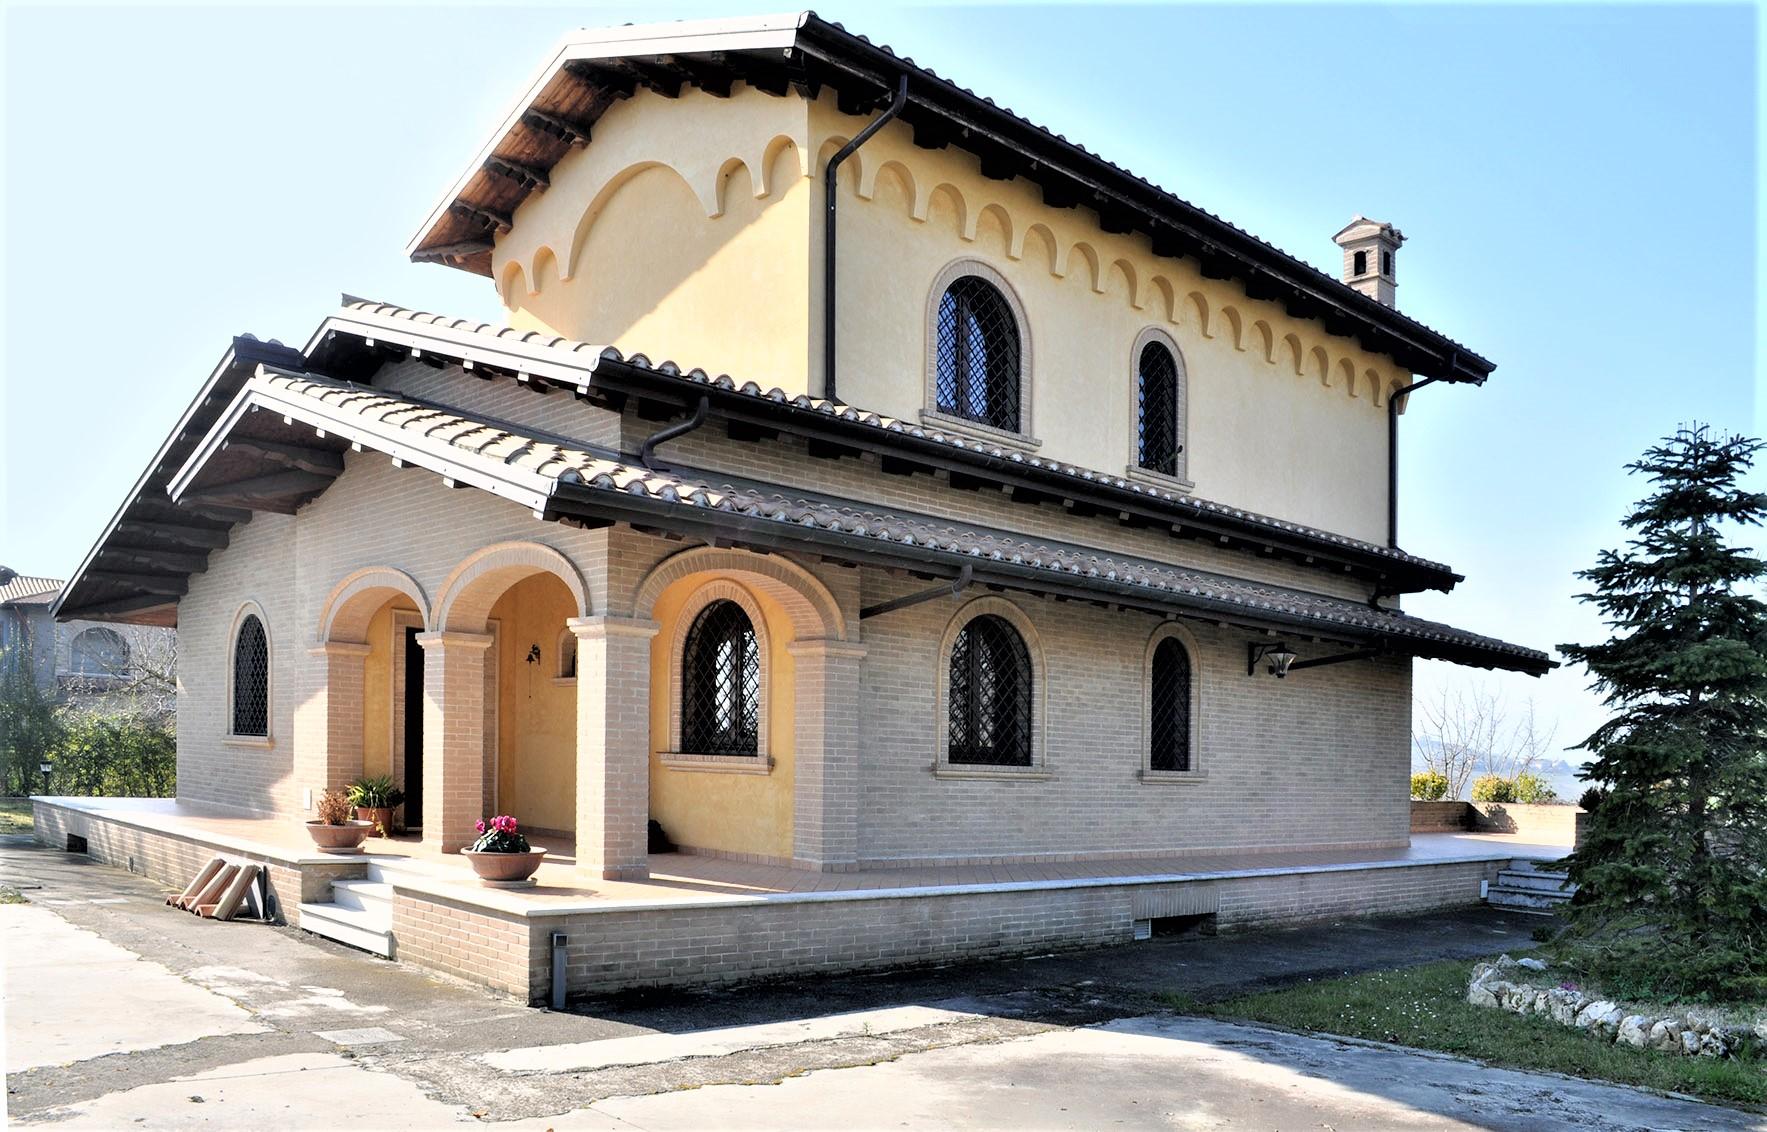 Villa Villa for sale Tortoreto (TE), Villa Bianca - Tortoreto - EUR 770.233 10